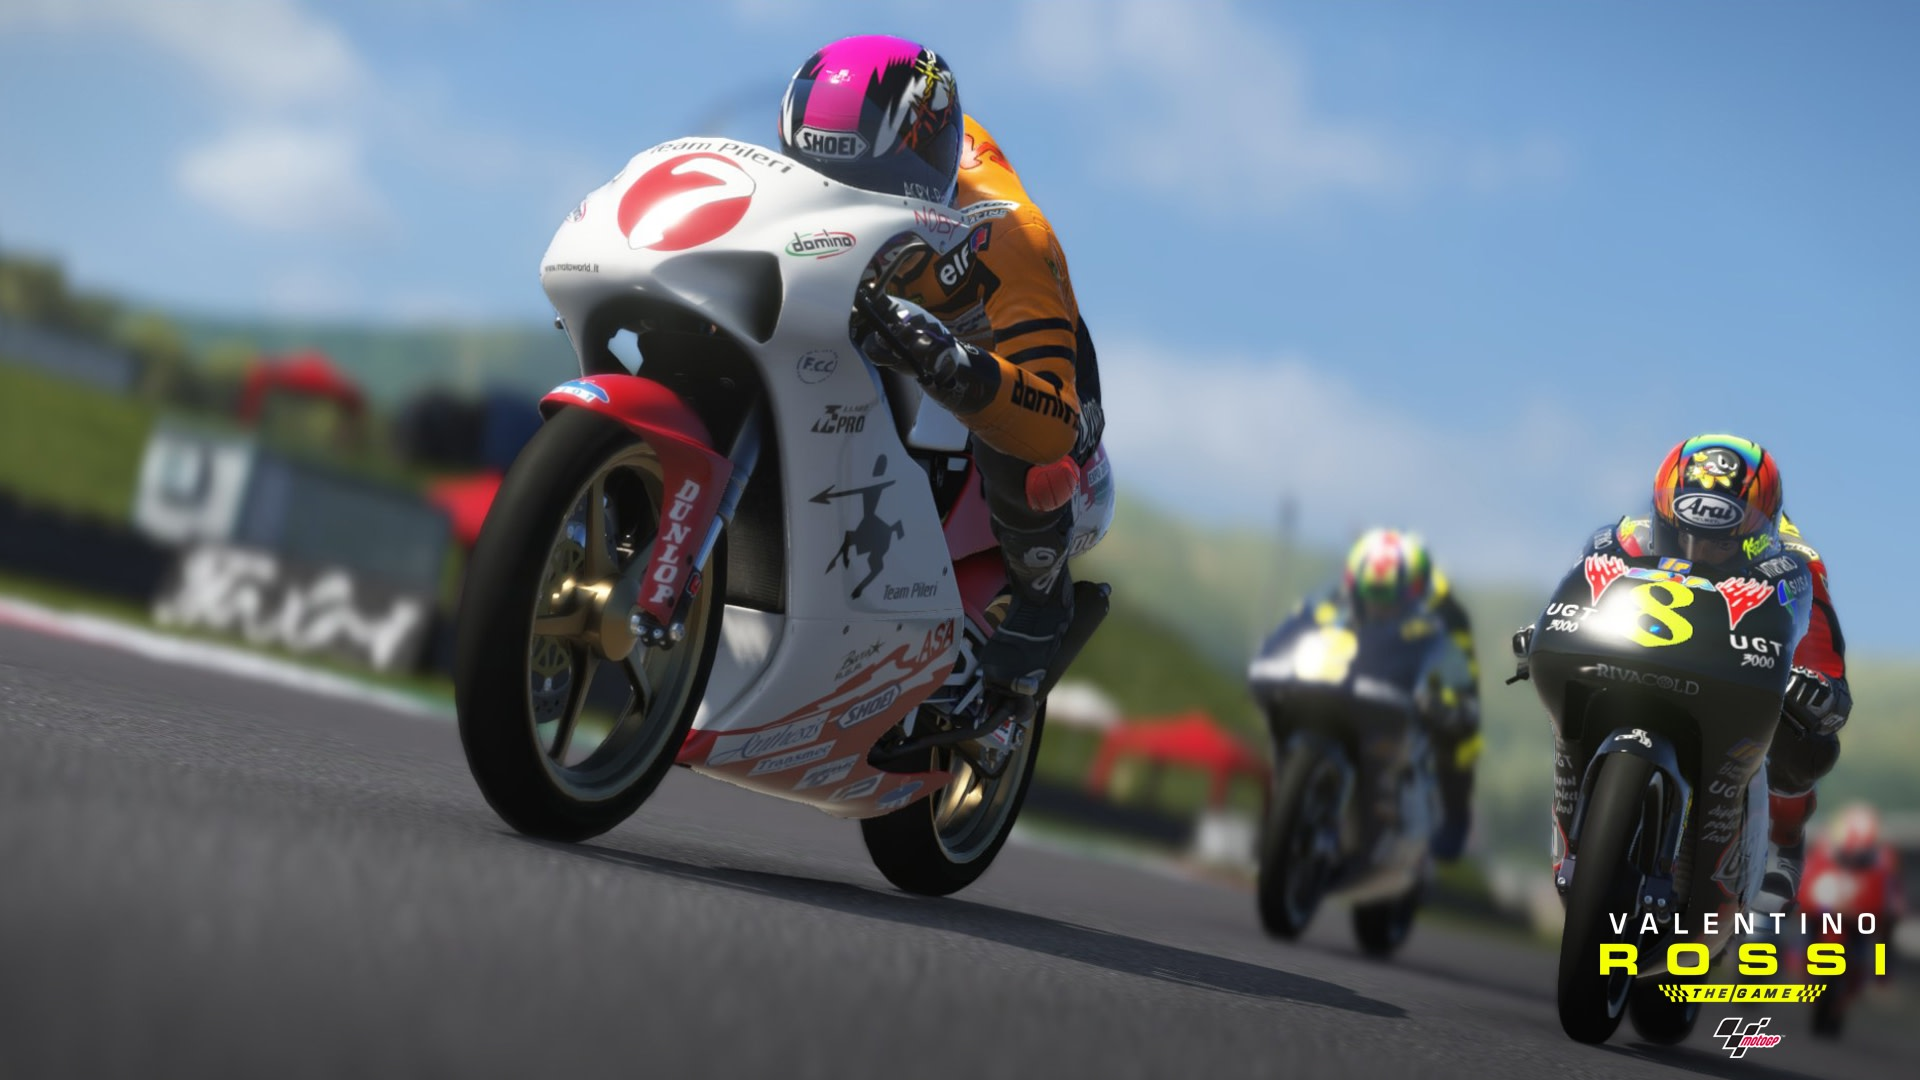 Motogp 14 Ps4 Karriere   MotoGP 2017 Info, Video, Points Table